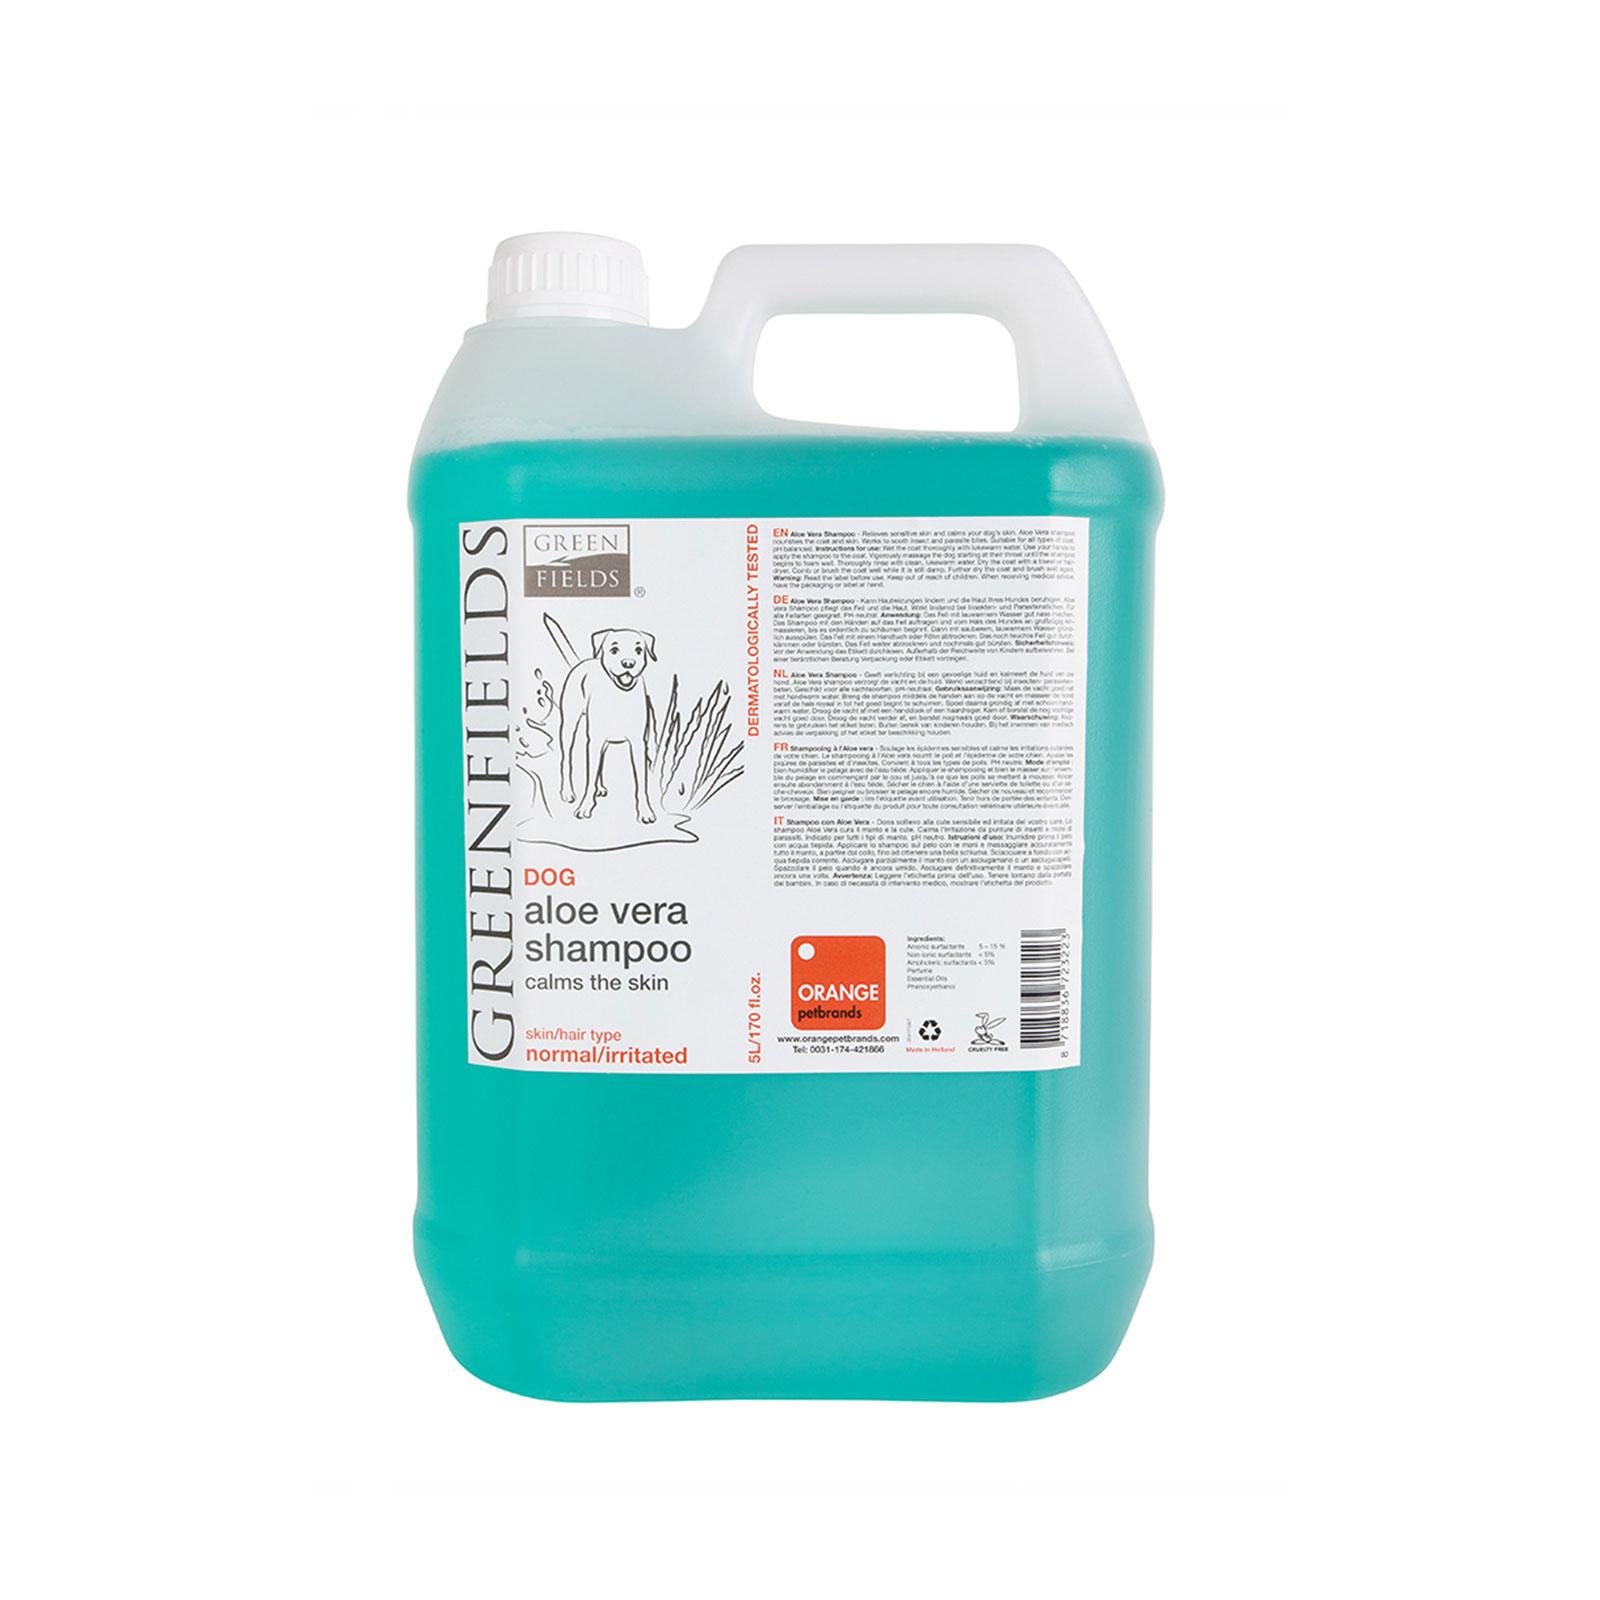 Greenfields - Aloe Vera Shampoo - Šampon za pse, aloe vera, protiv buve i krpelja